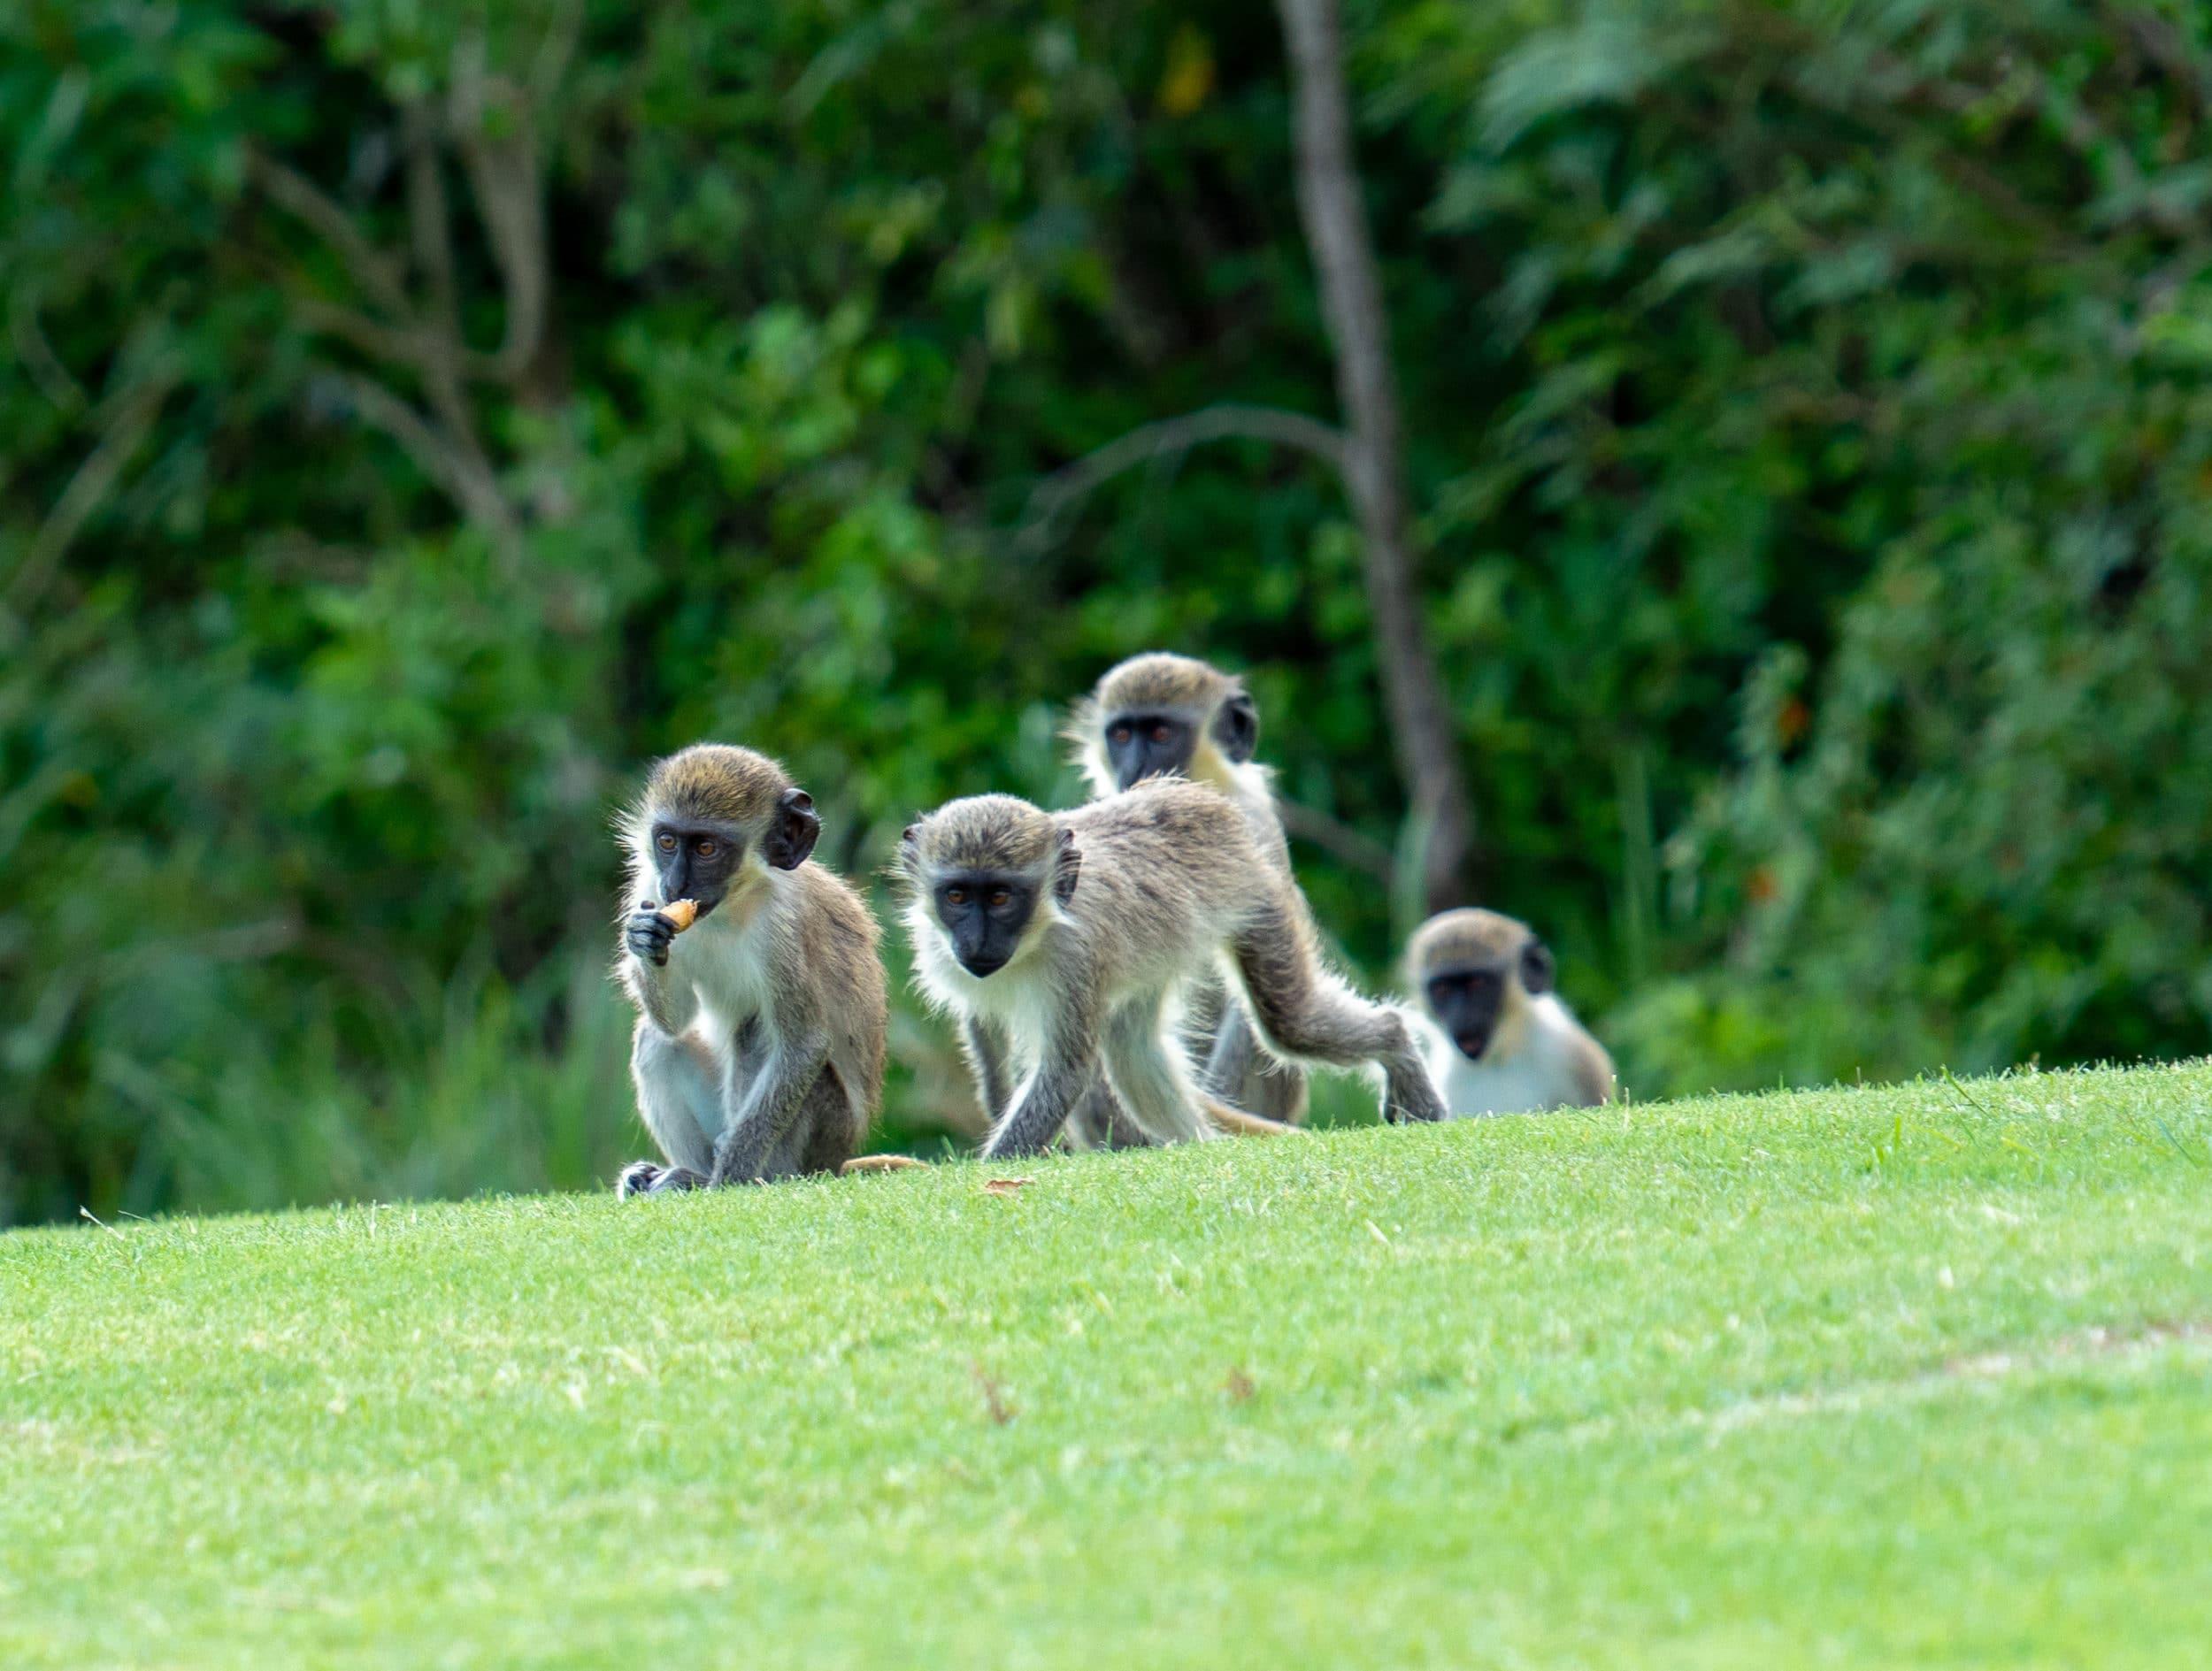 Monkeys on the Four Seasons Nevis golf course